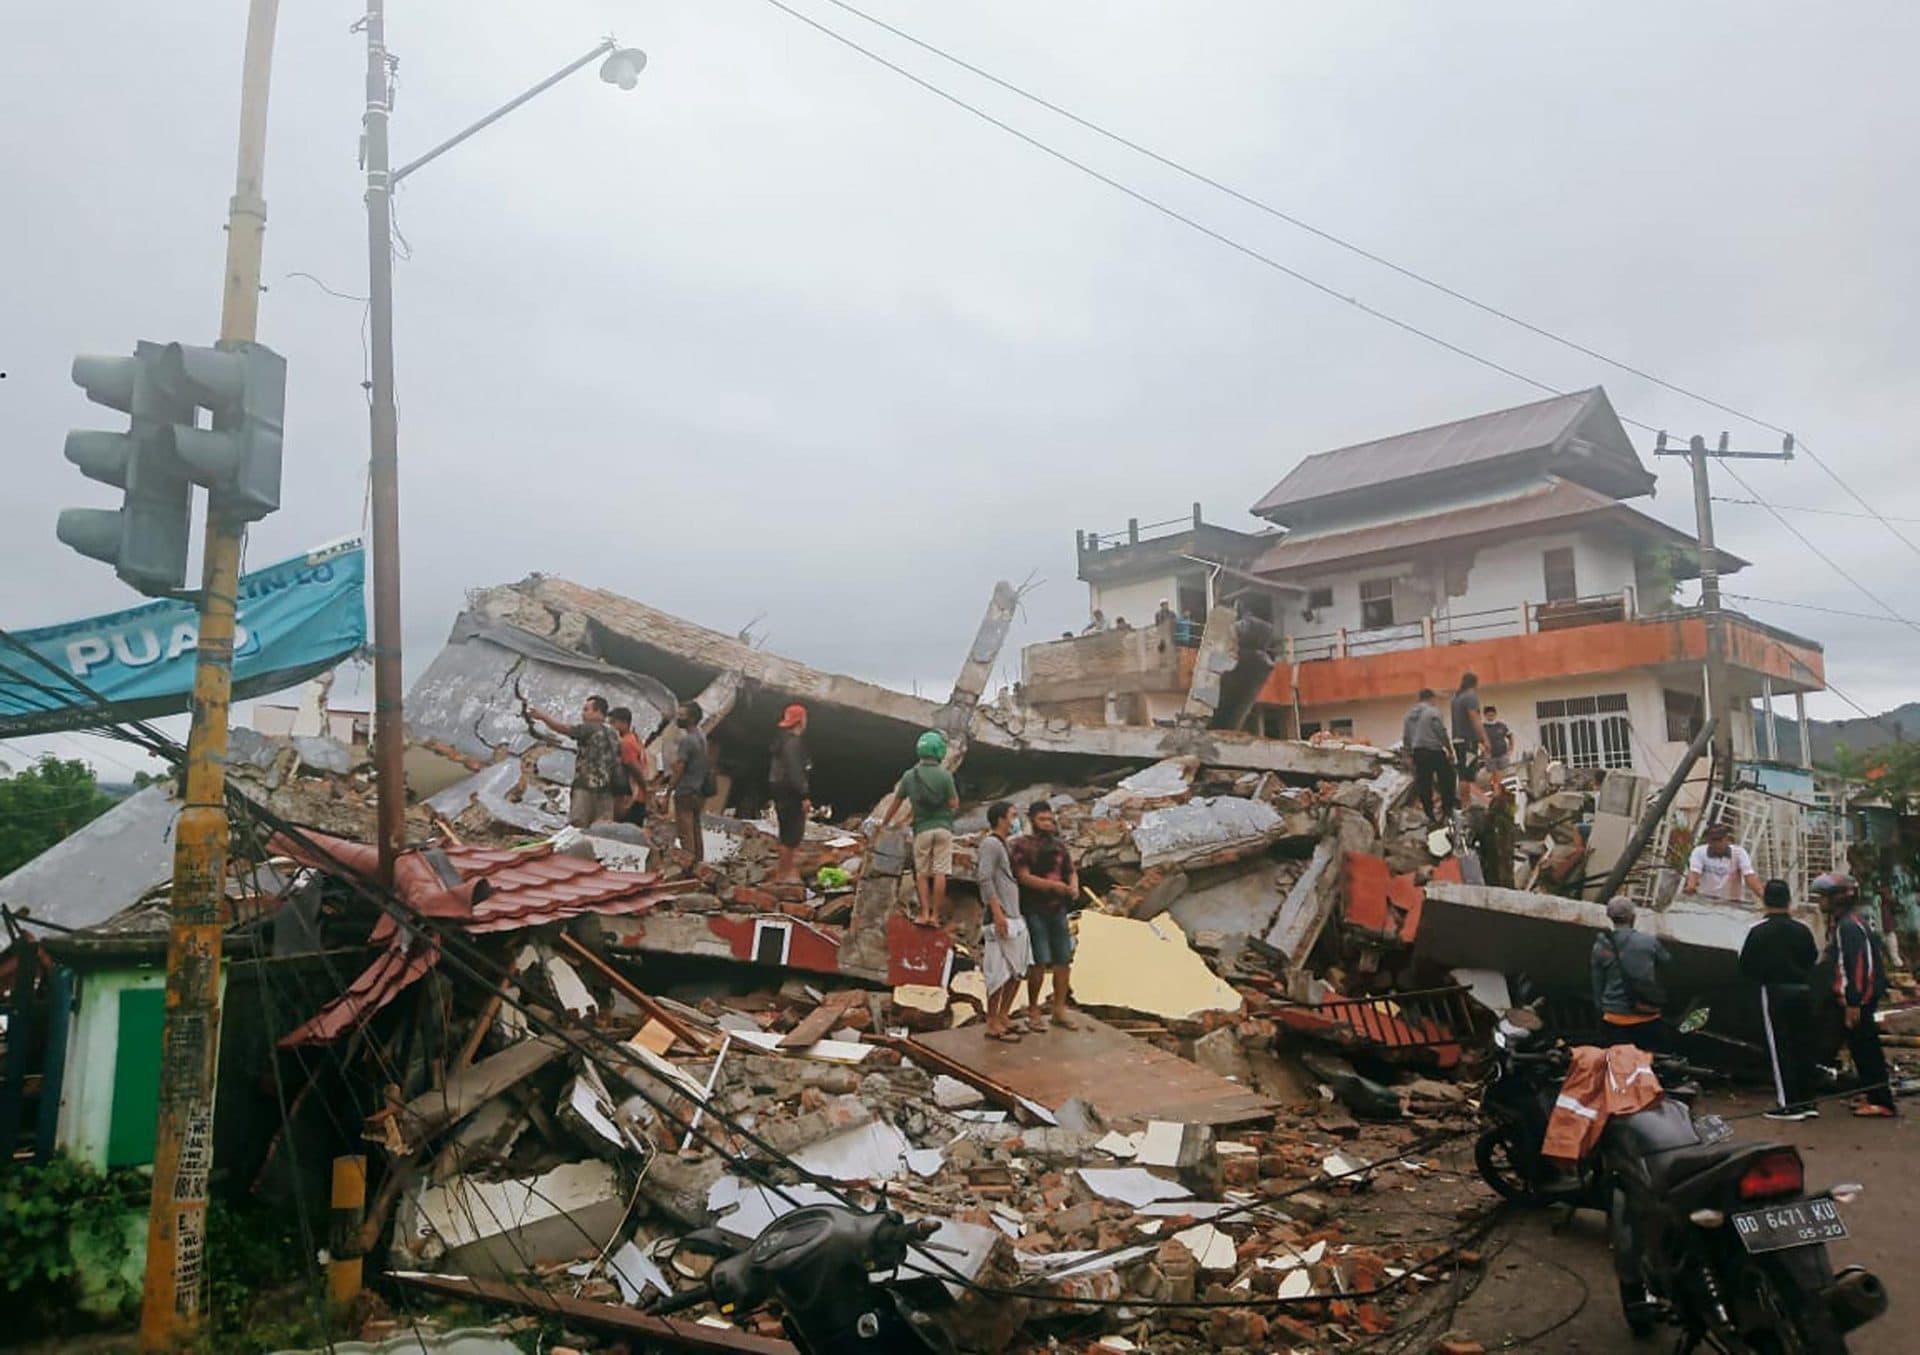 Dutzende Tote bei Erdbeben in Indonesien Pazifischer Feuerring